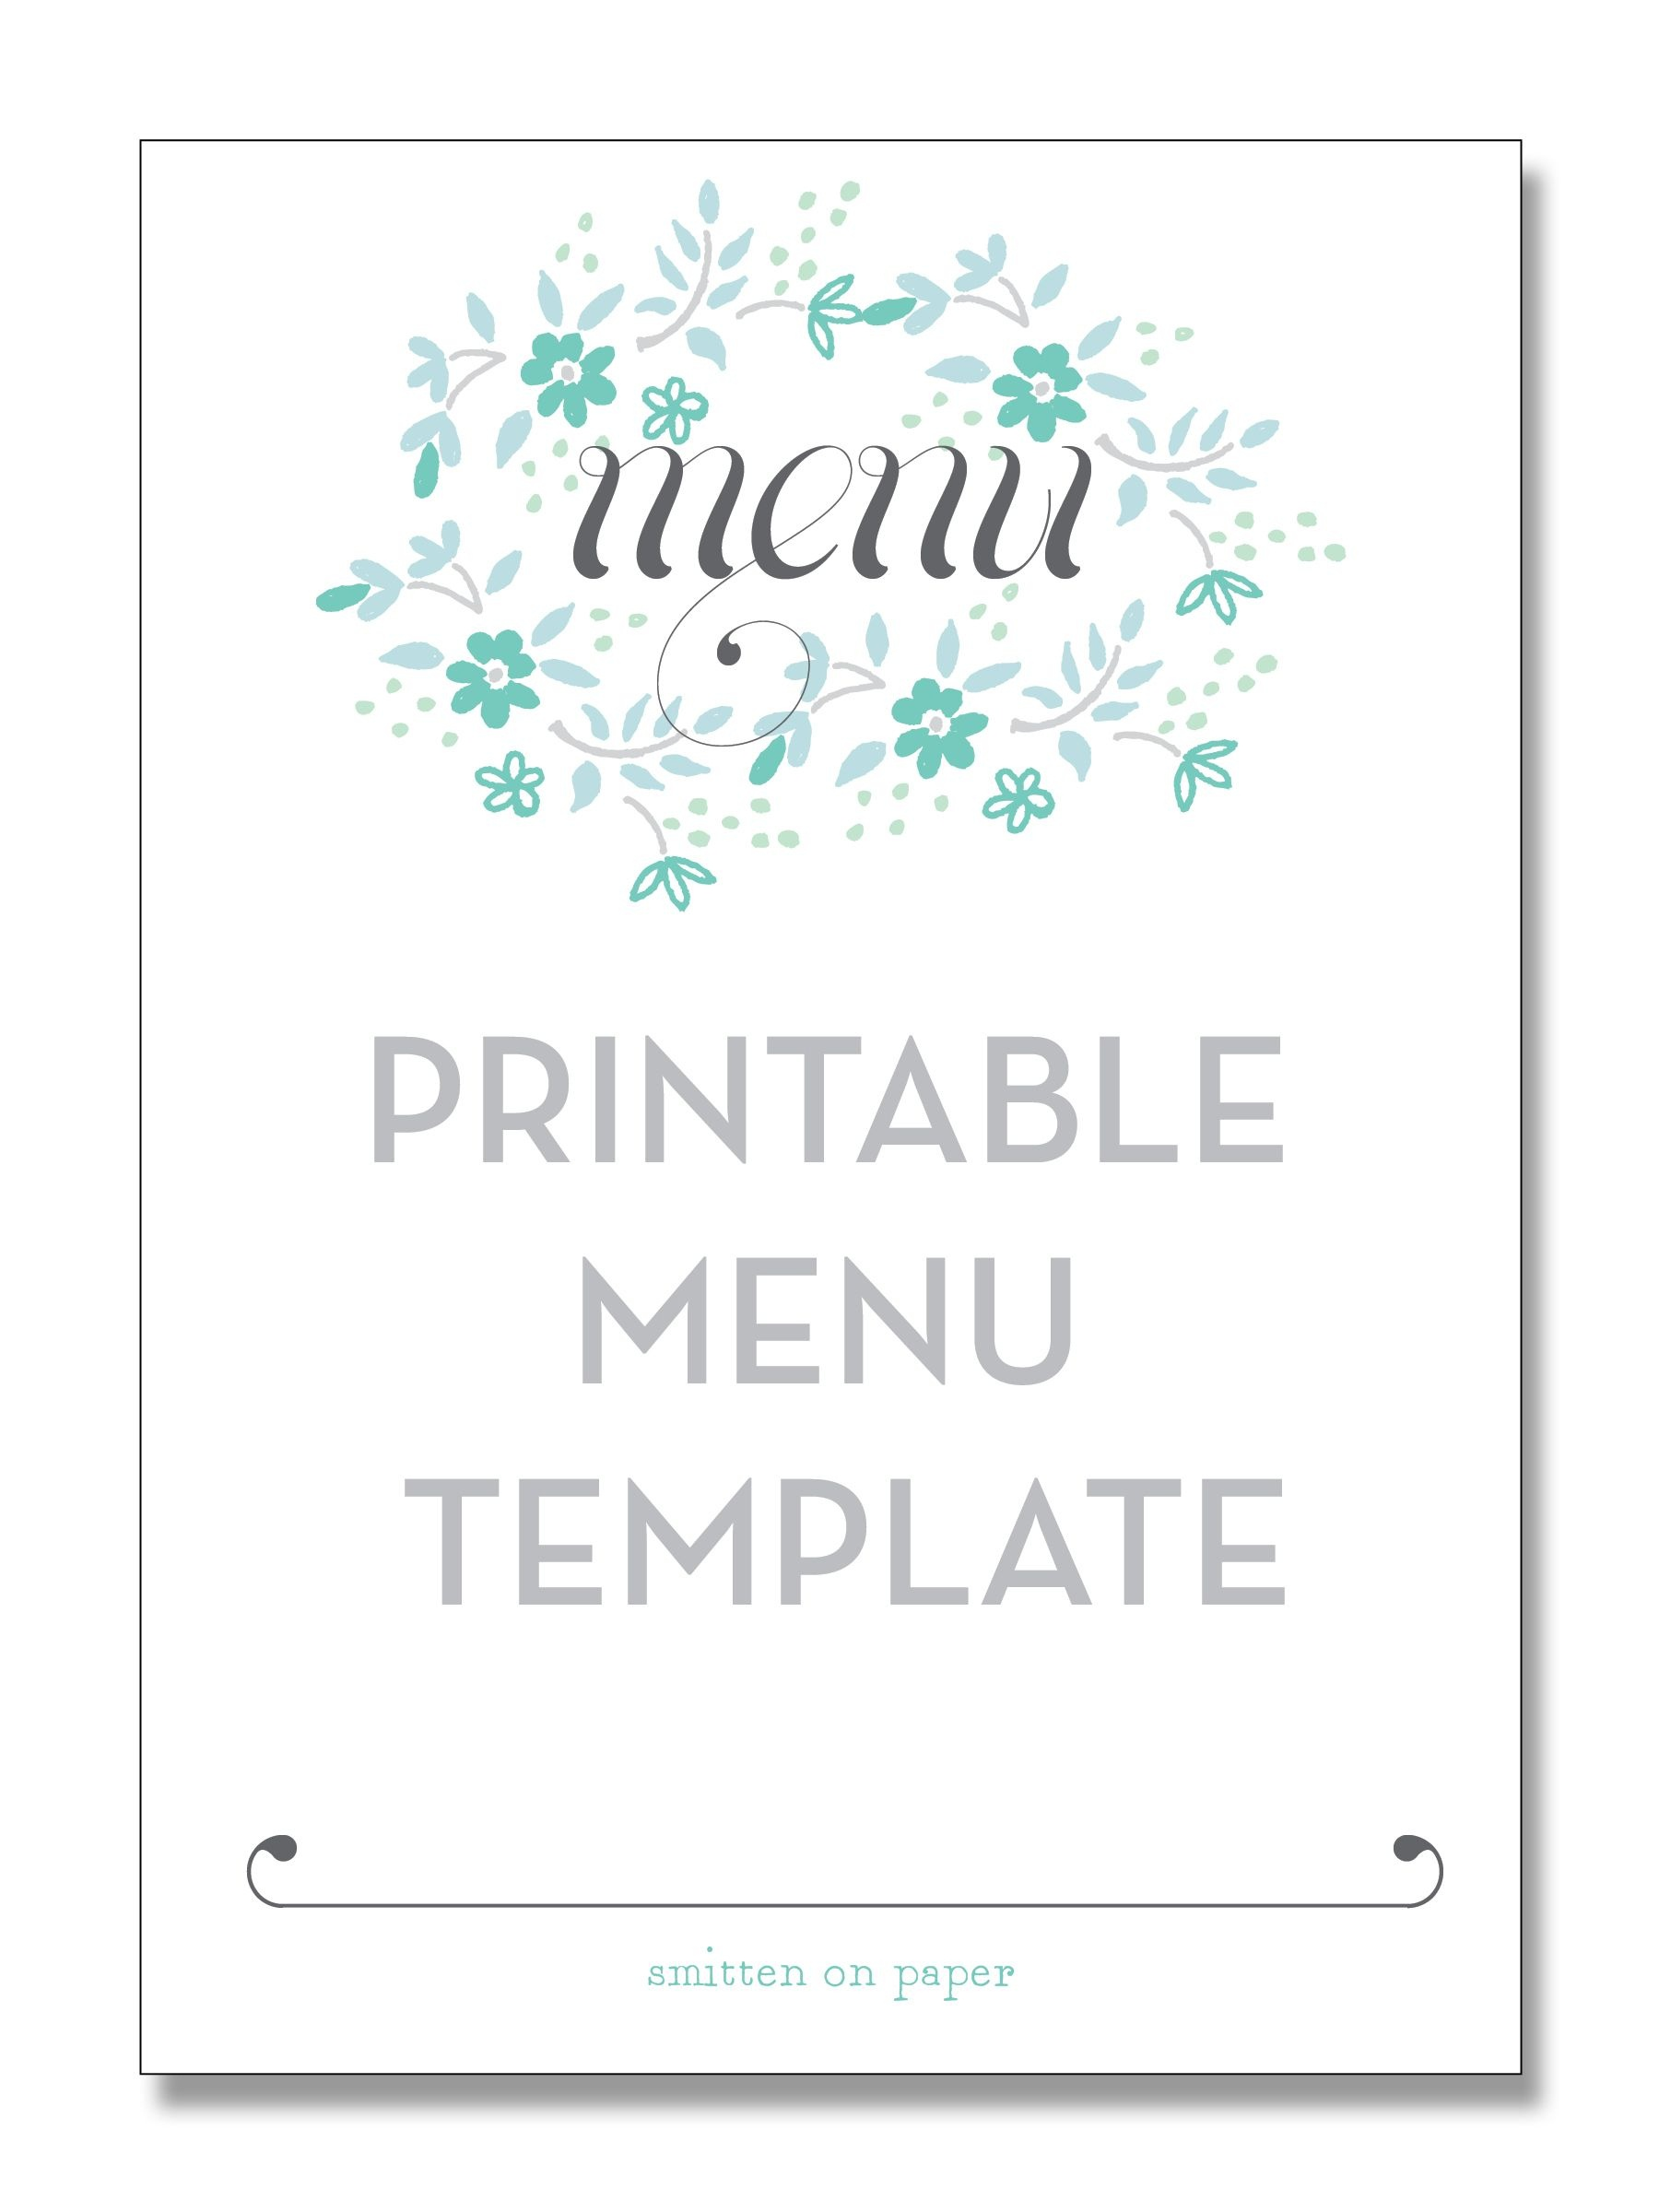 Free Menu Template Printable - Tutlin.psstech.co - Christmas Menu Printable Template Free